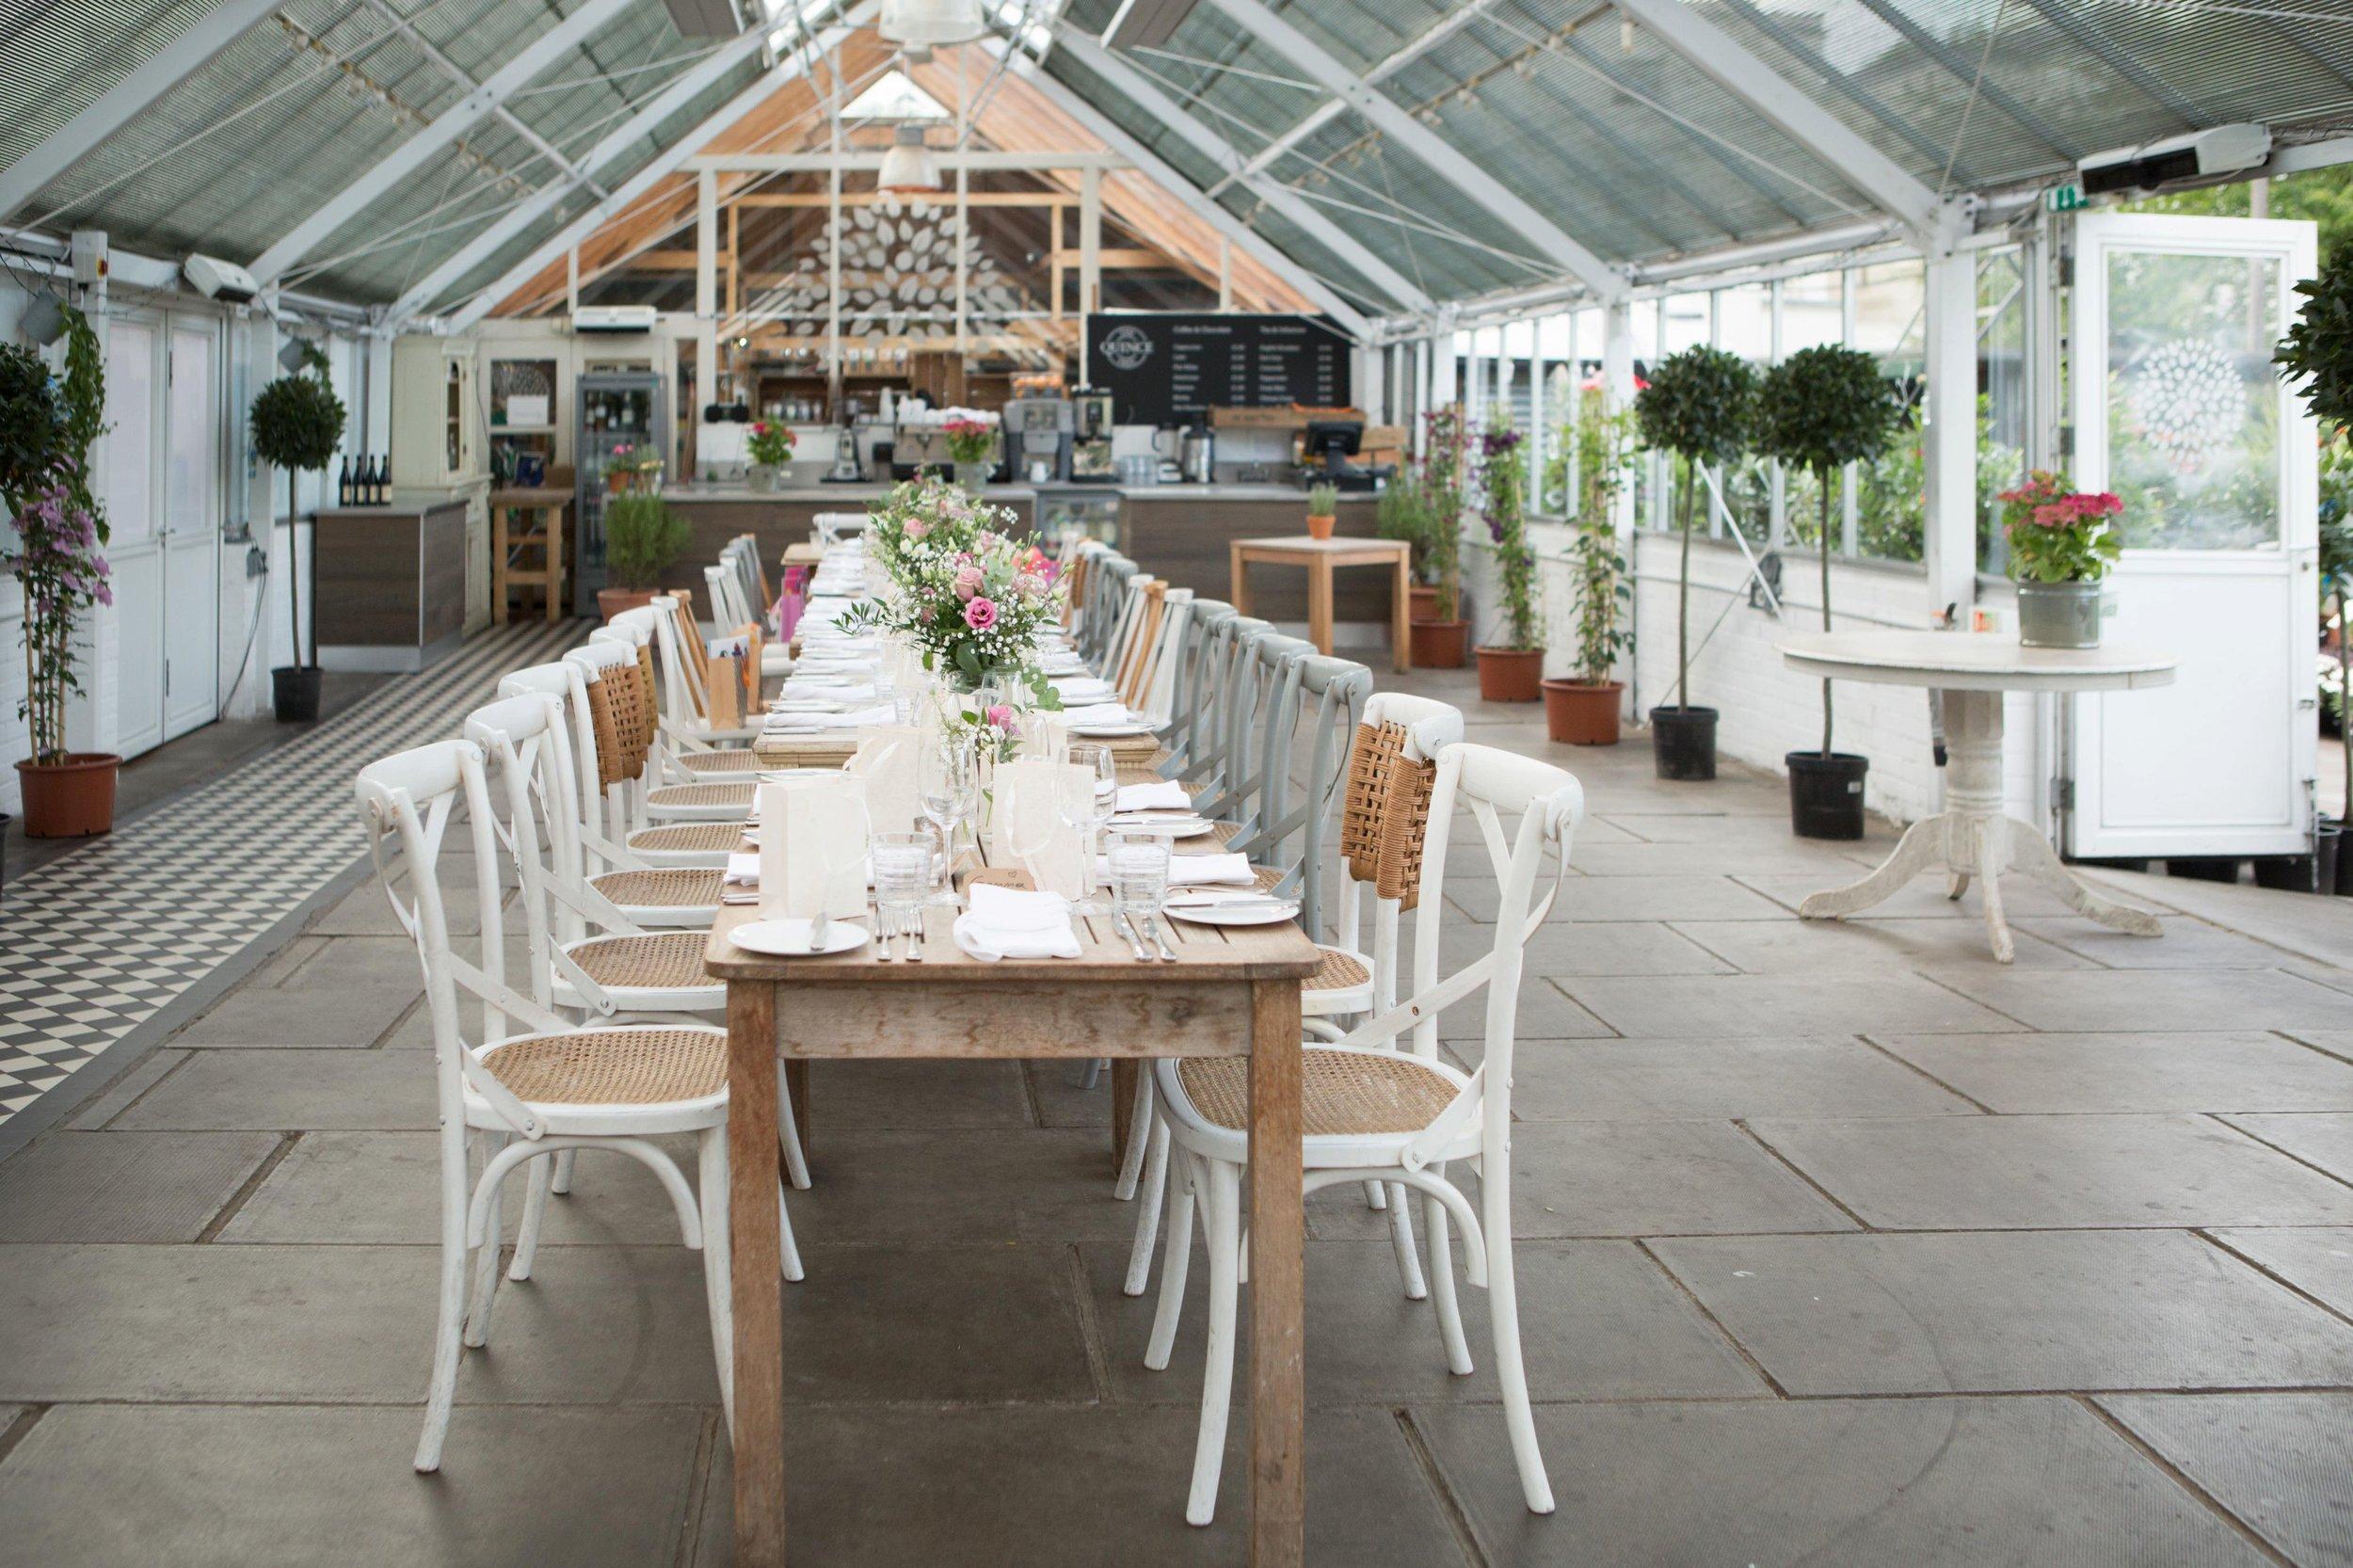 Hulya_&_Ben's_Clifton_Nurseries_London_Wedding_0438.jpg